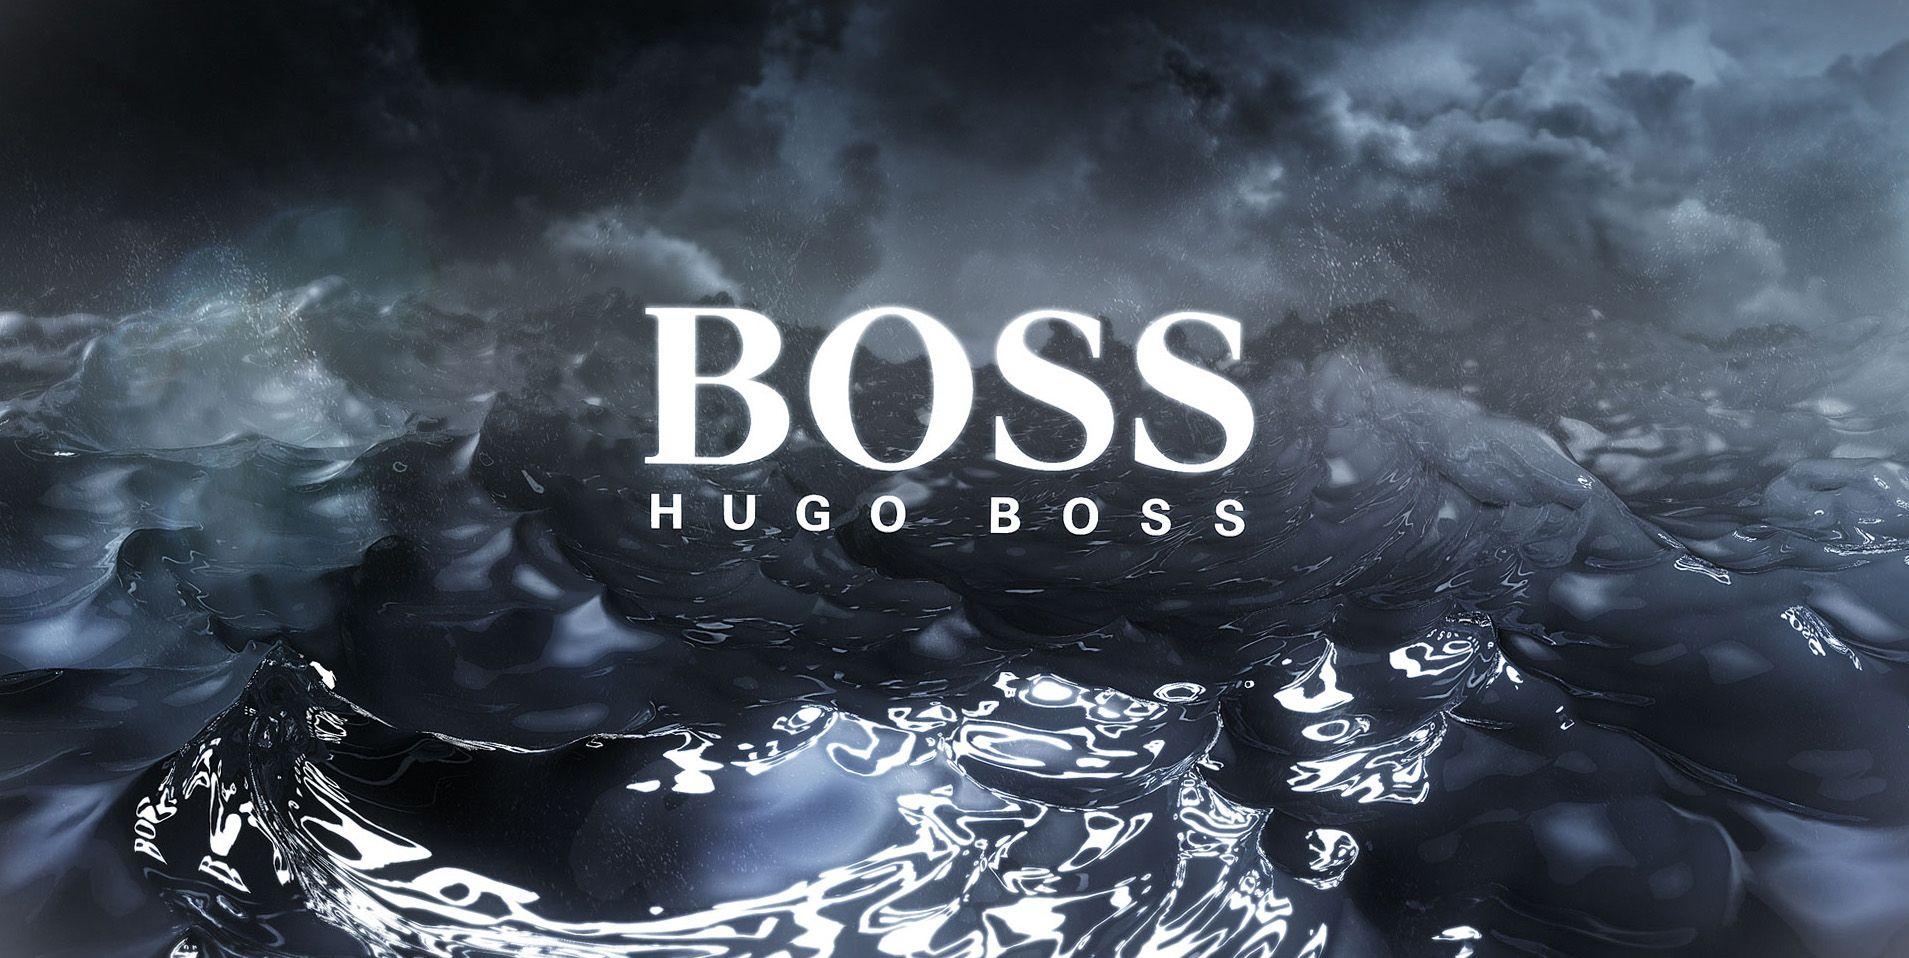 Hugo Boss | Special Sales in allen Outlets in DE/A